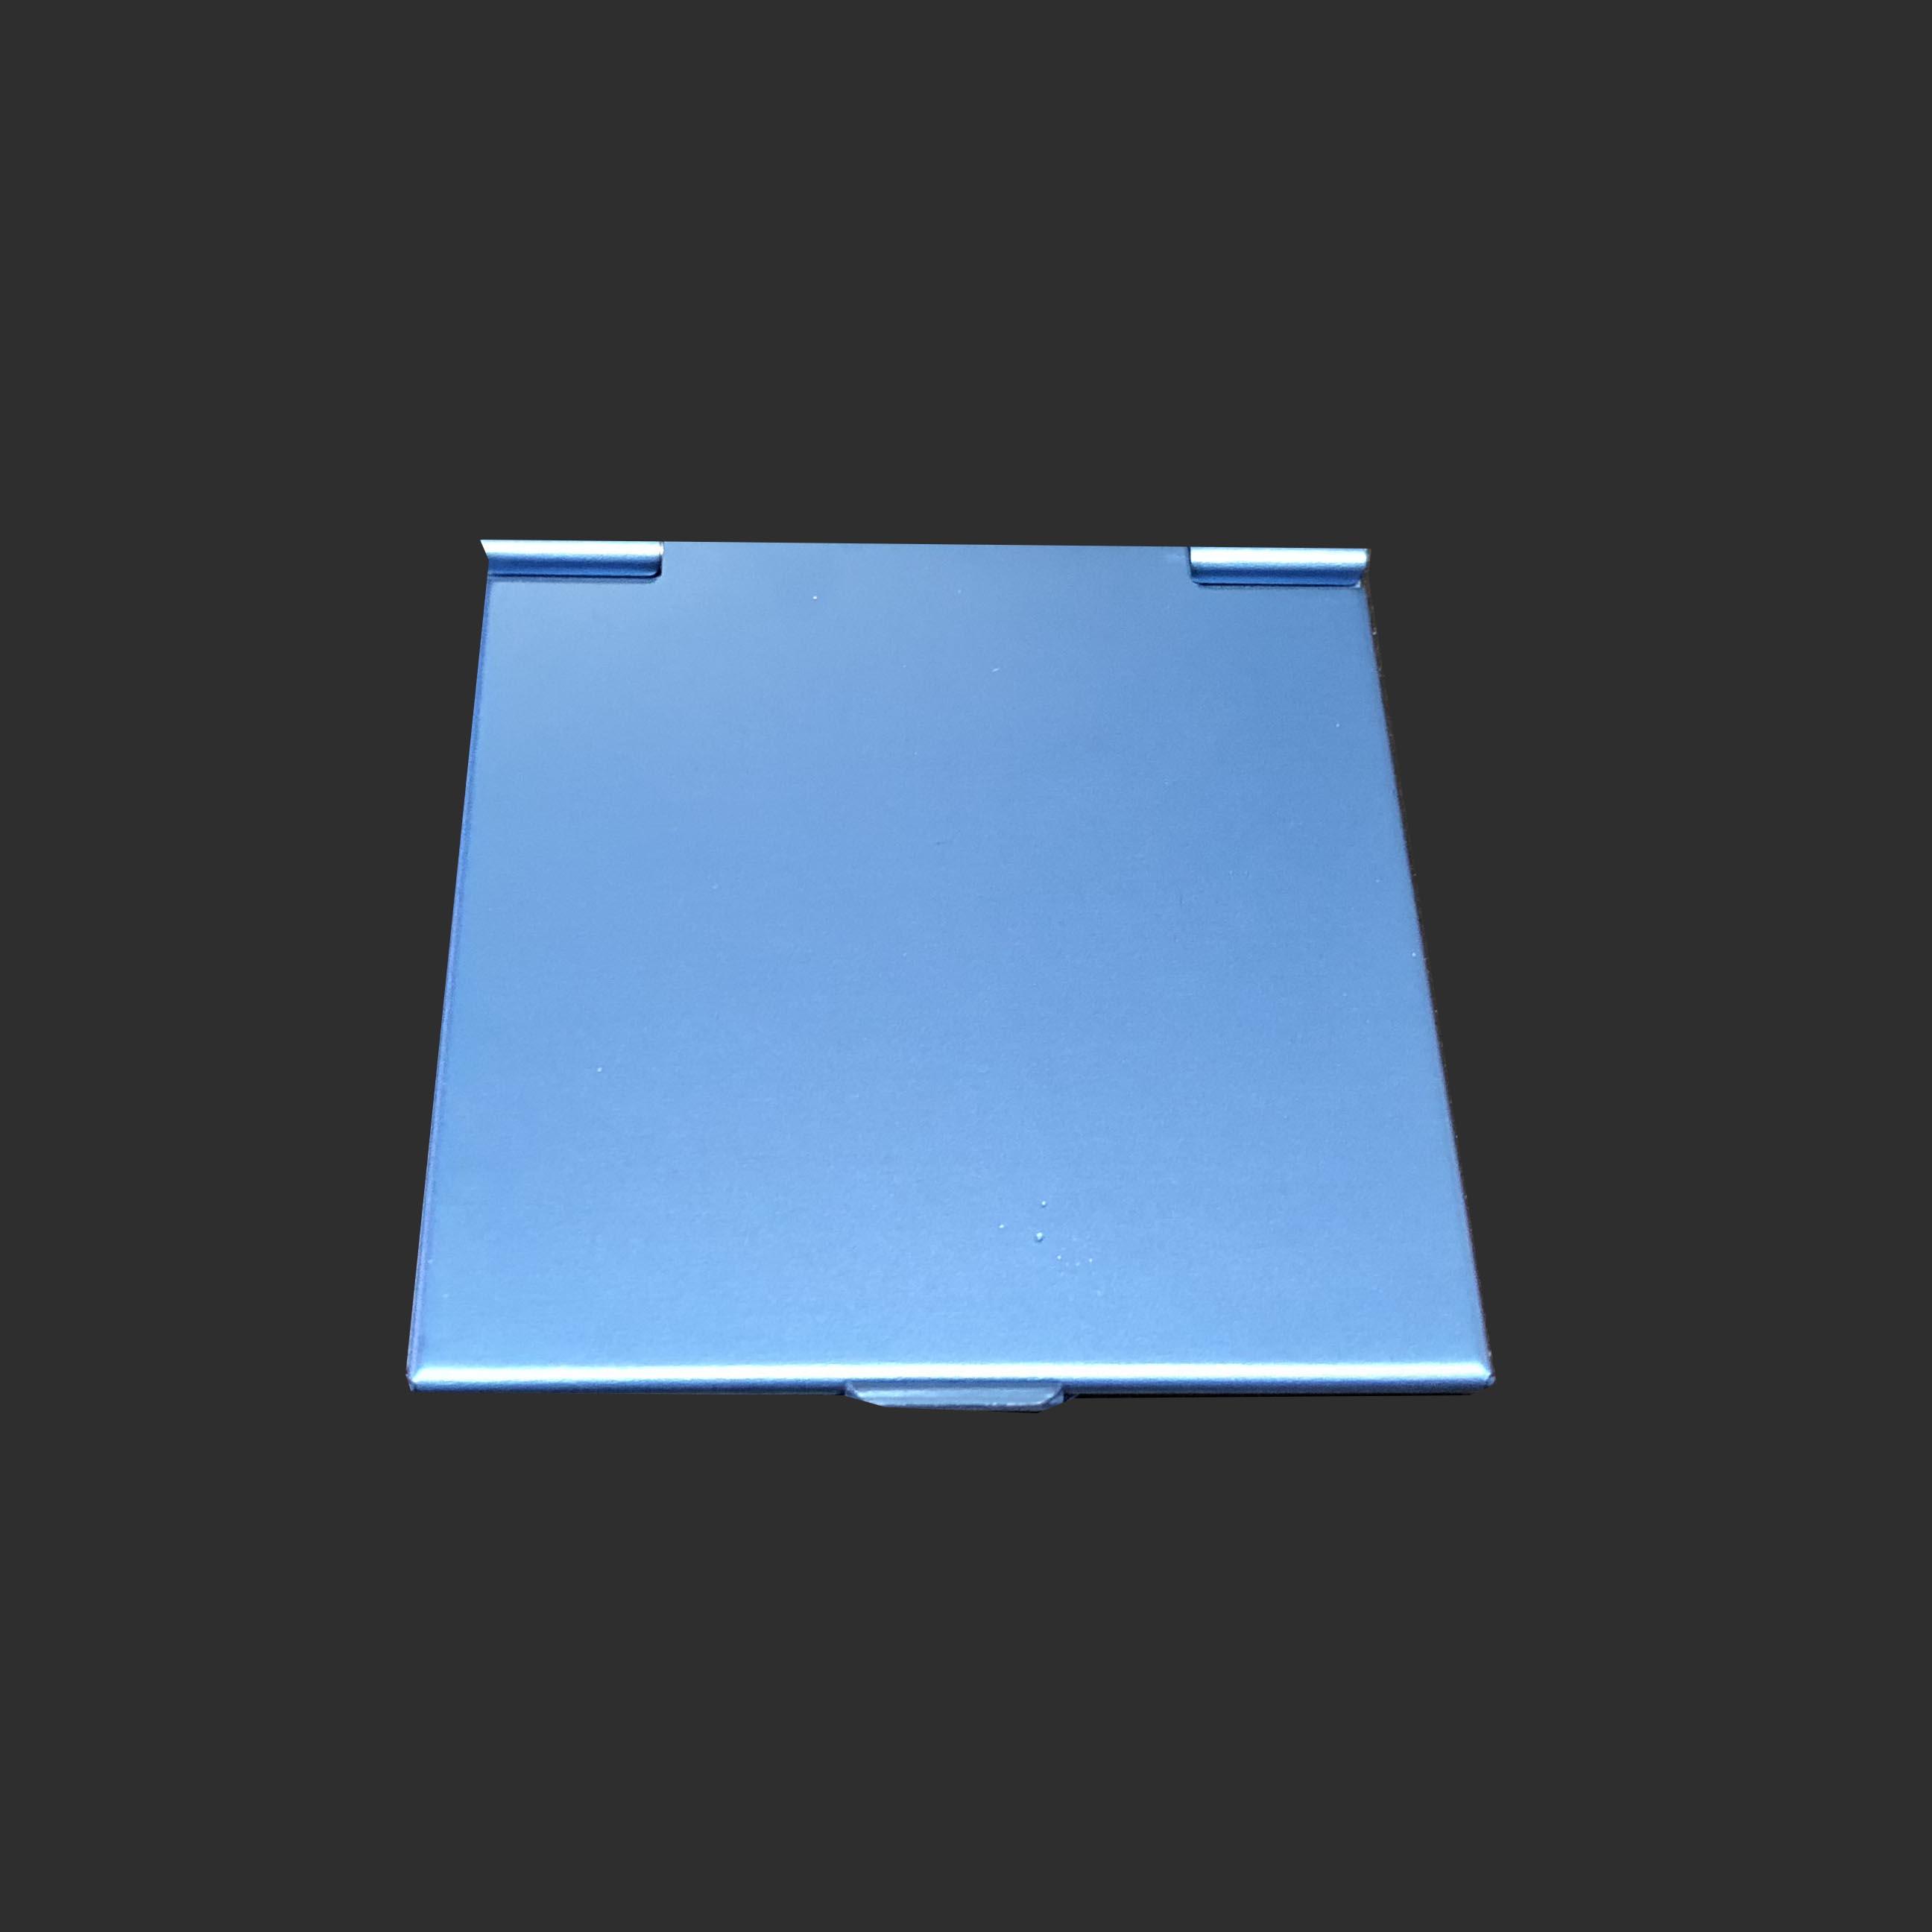 Ipromo Array image7